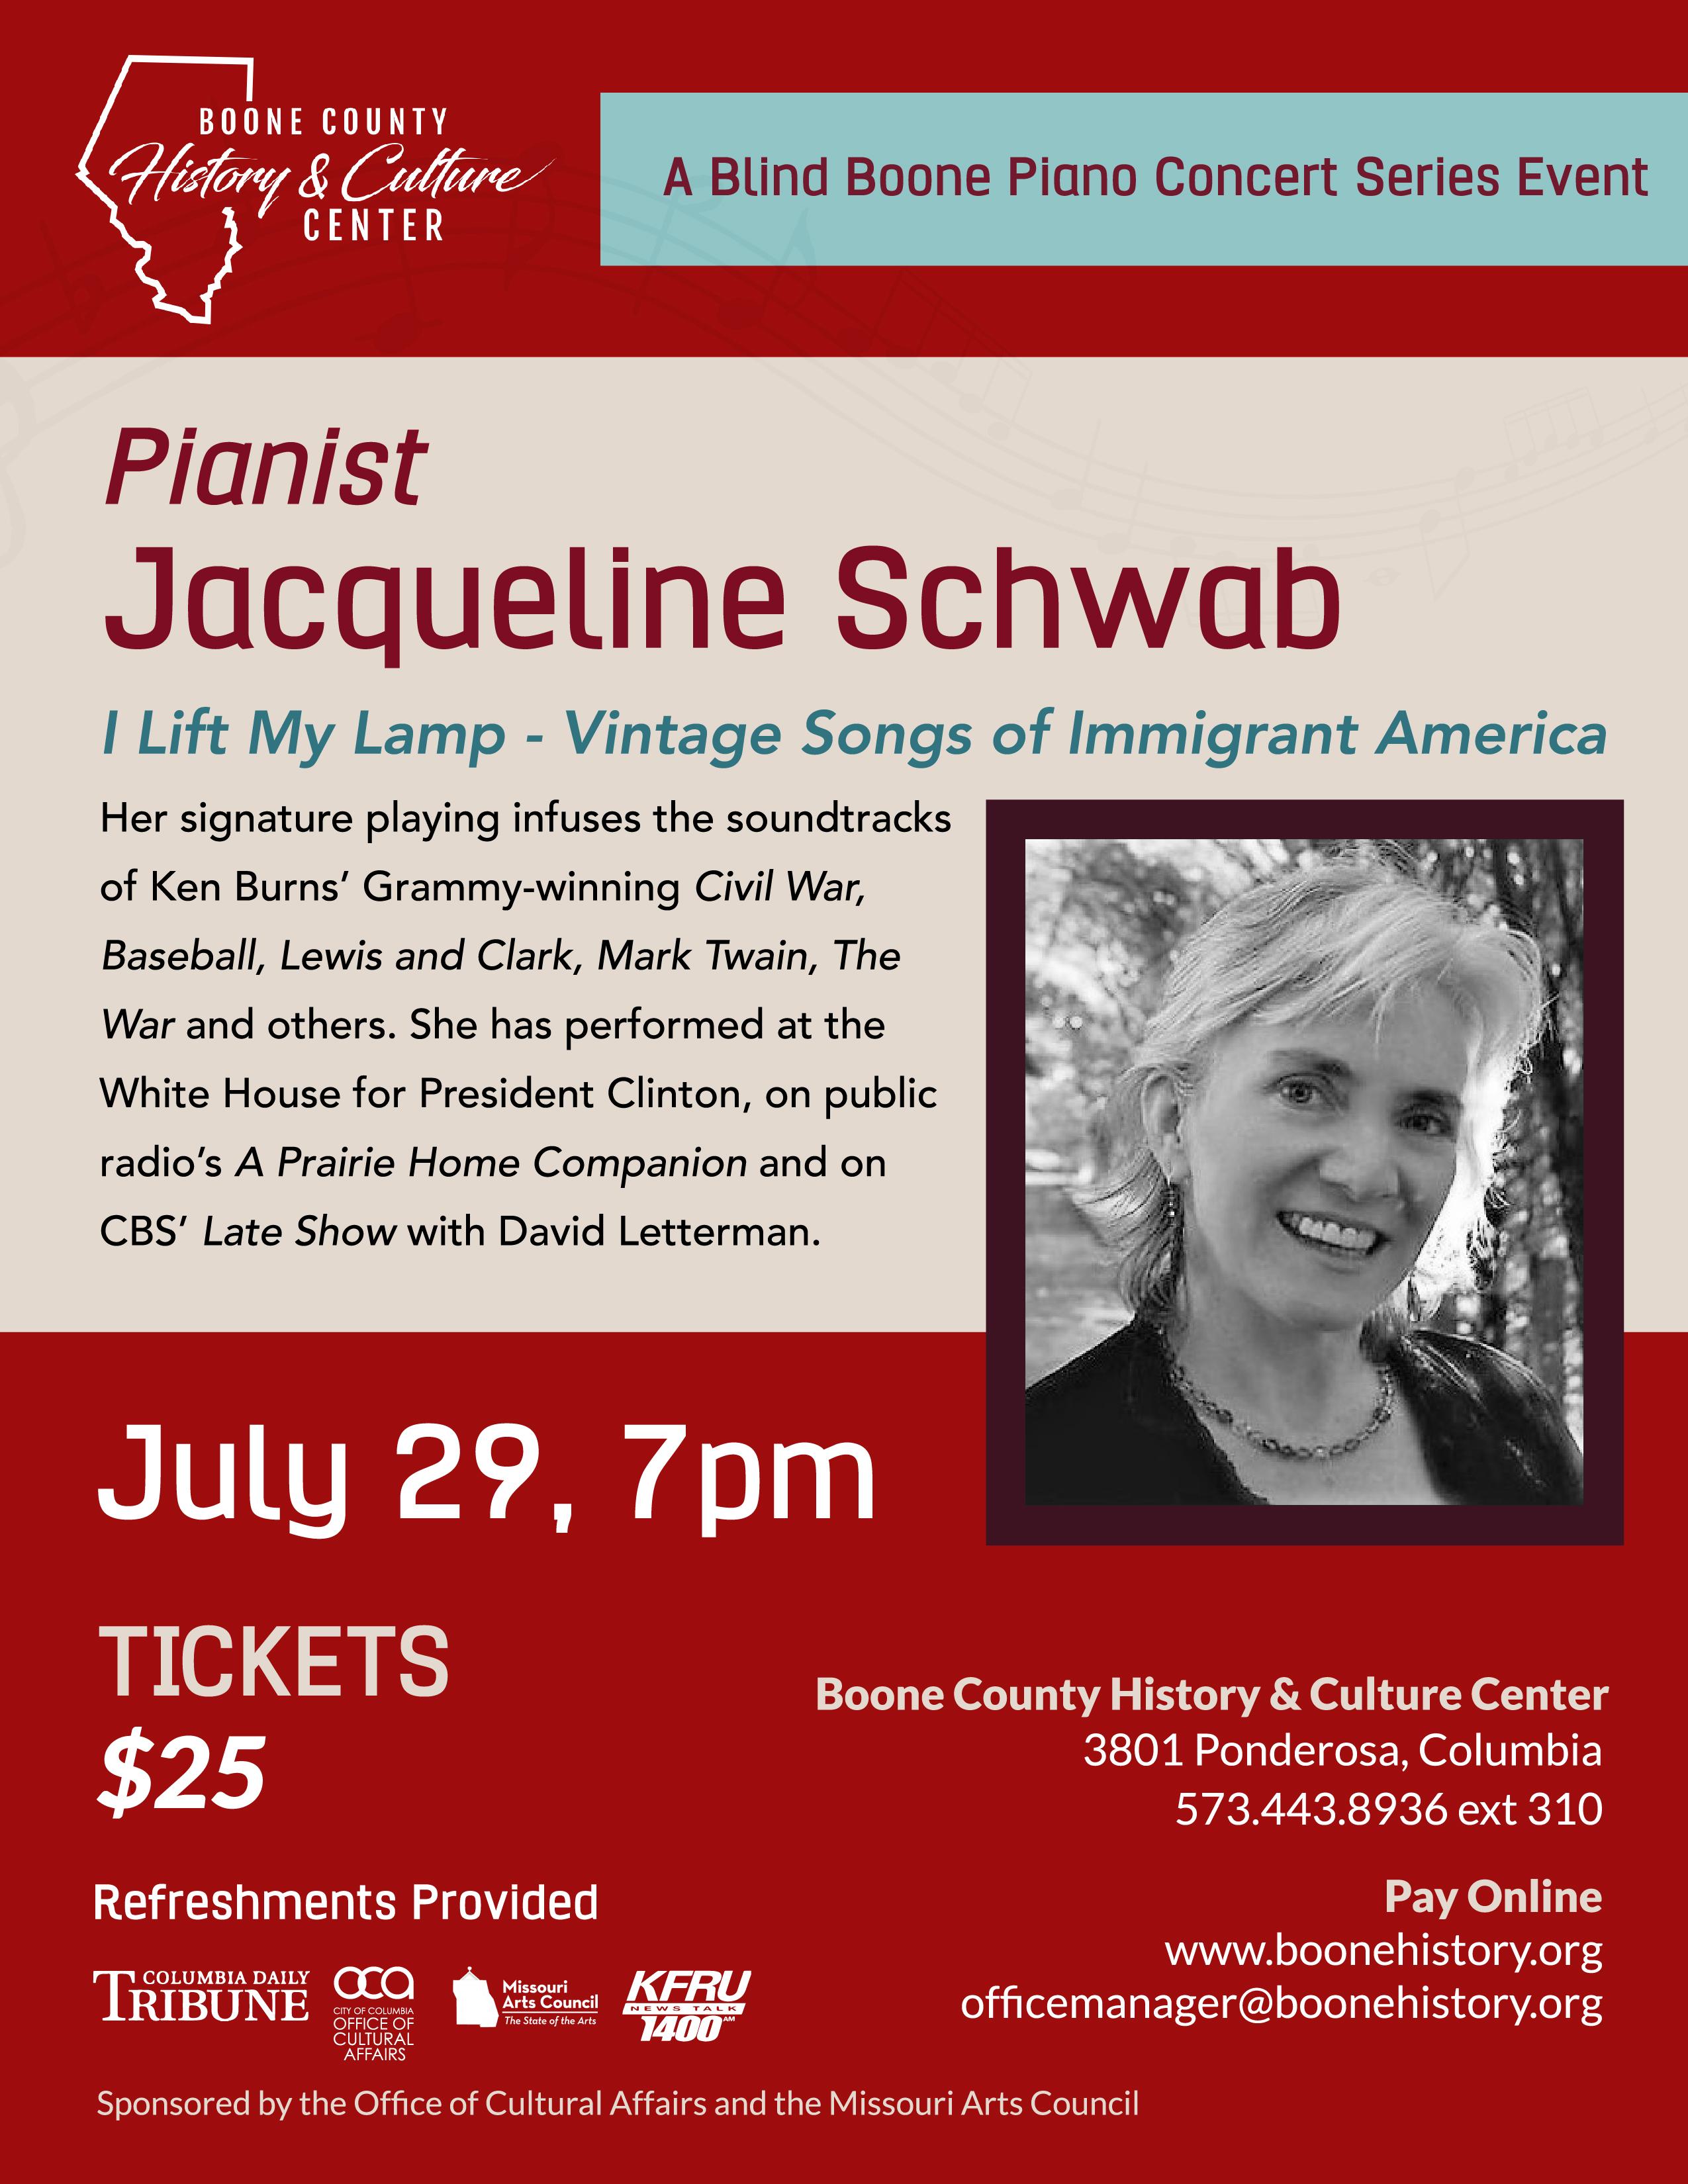 Pianist Jacqueline Schwab – I Lift My Lamp – Vintage Songs of Immigrant America